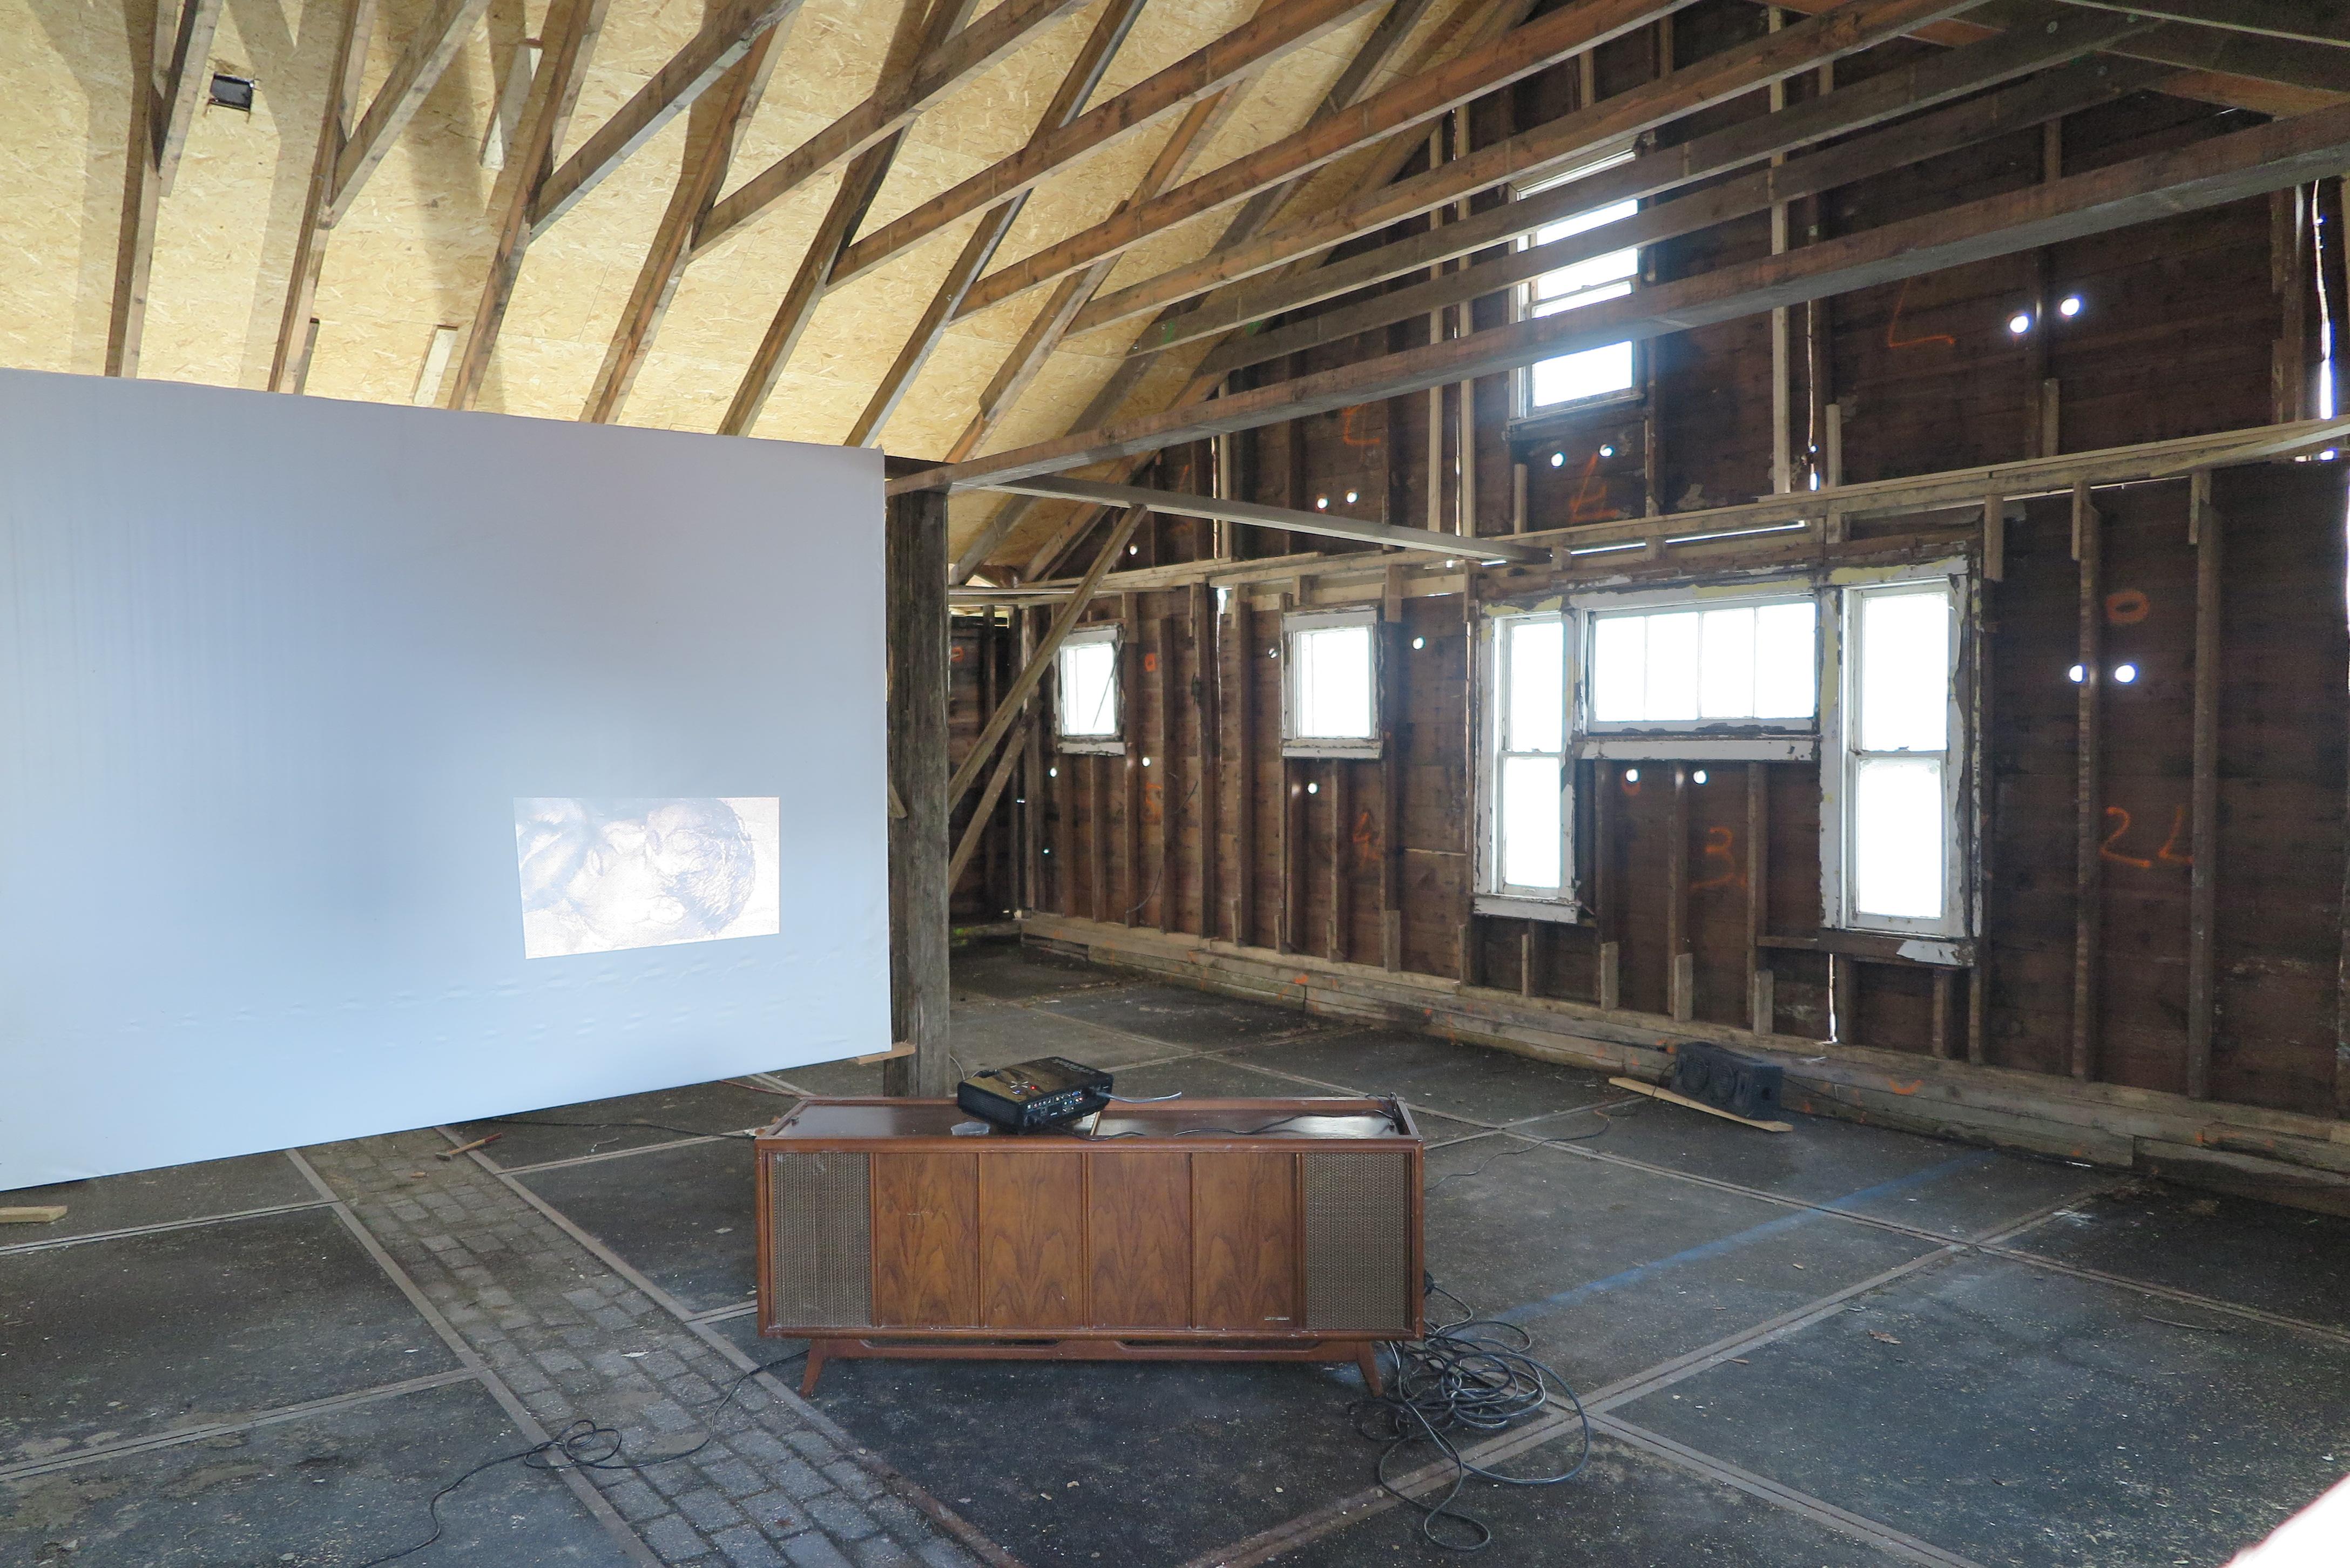 House from Detroit - Ryan Mendoza - 2016